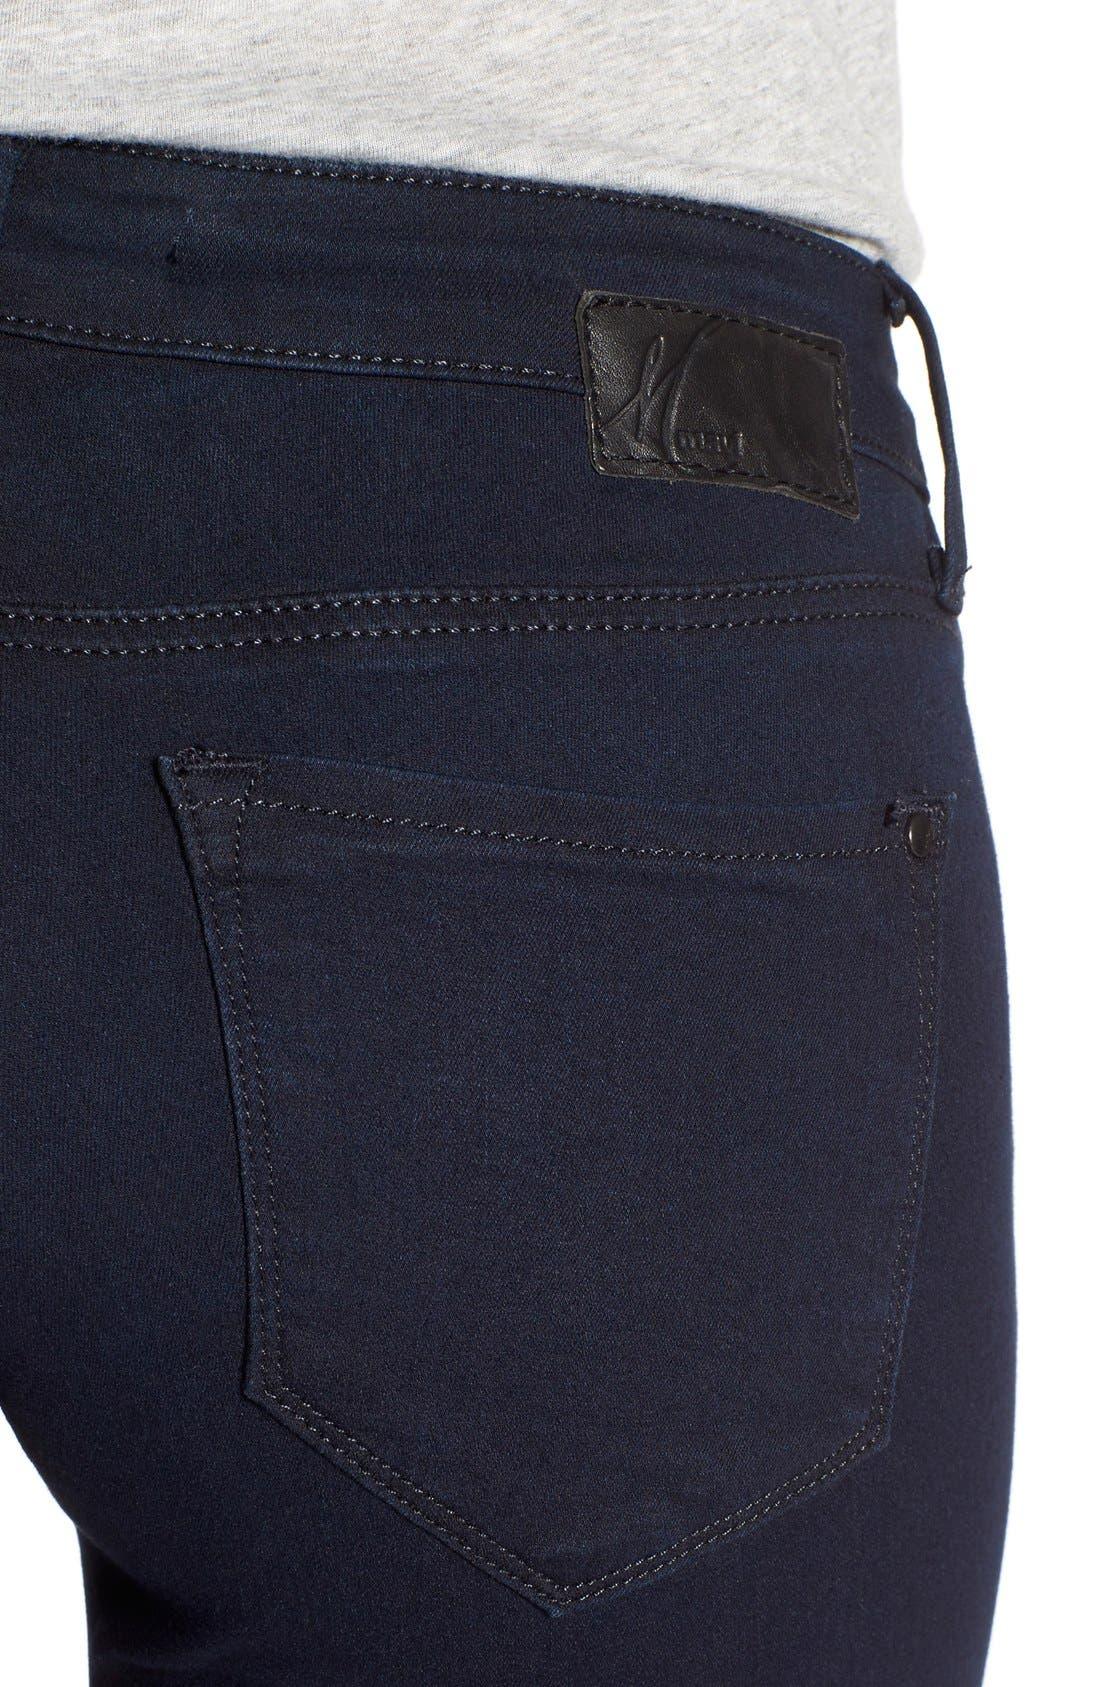 'Serena' Stretch Skinny Jeans,                             Alternate thumbnail 3, color,